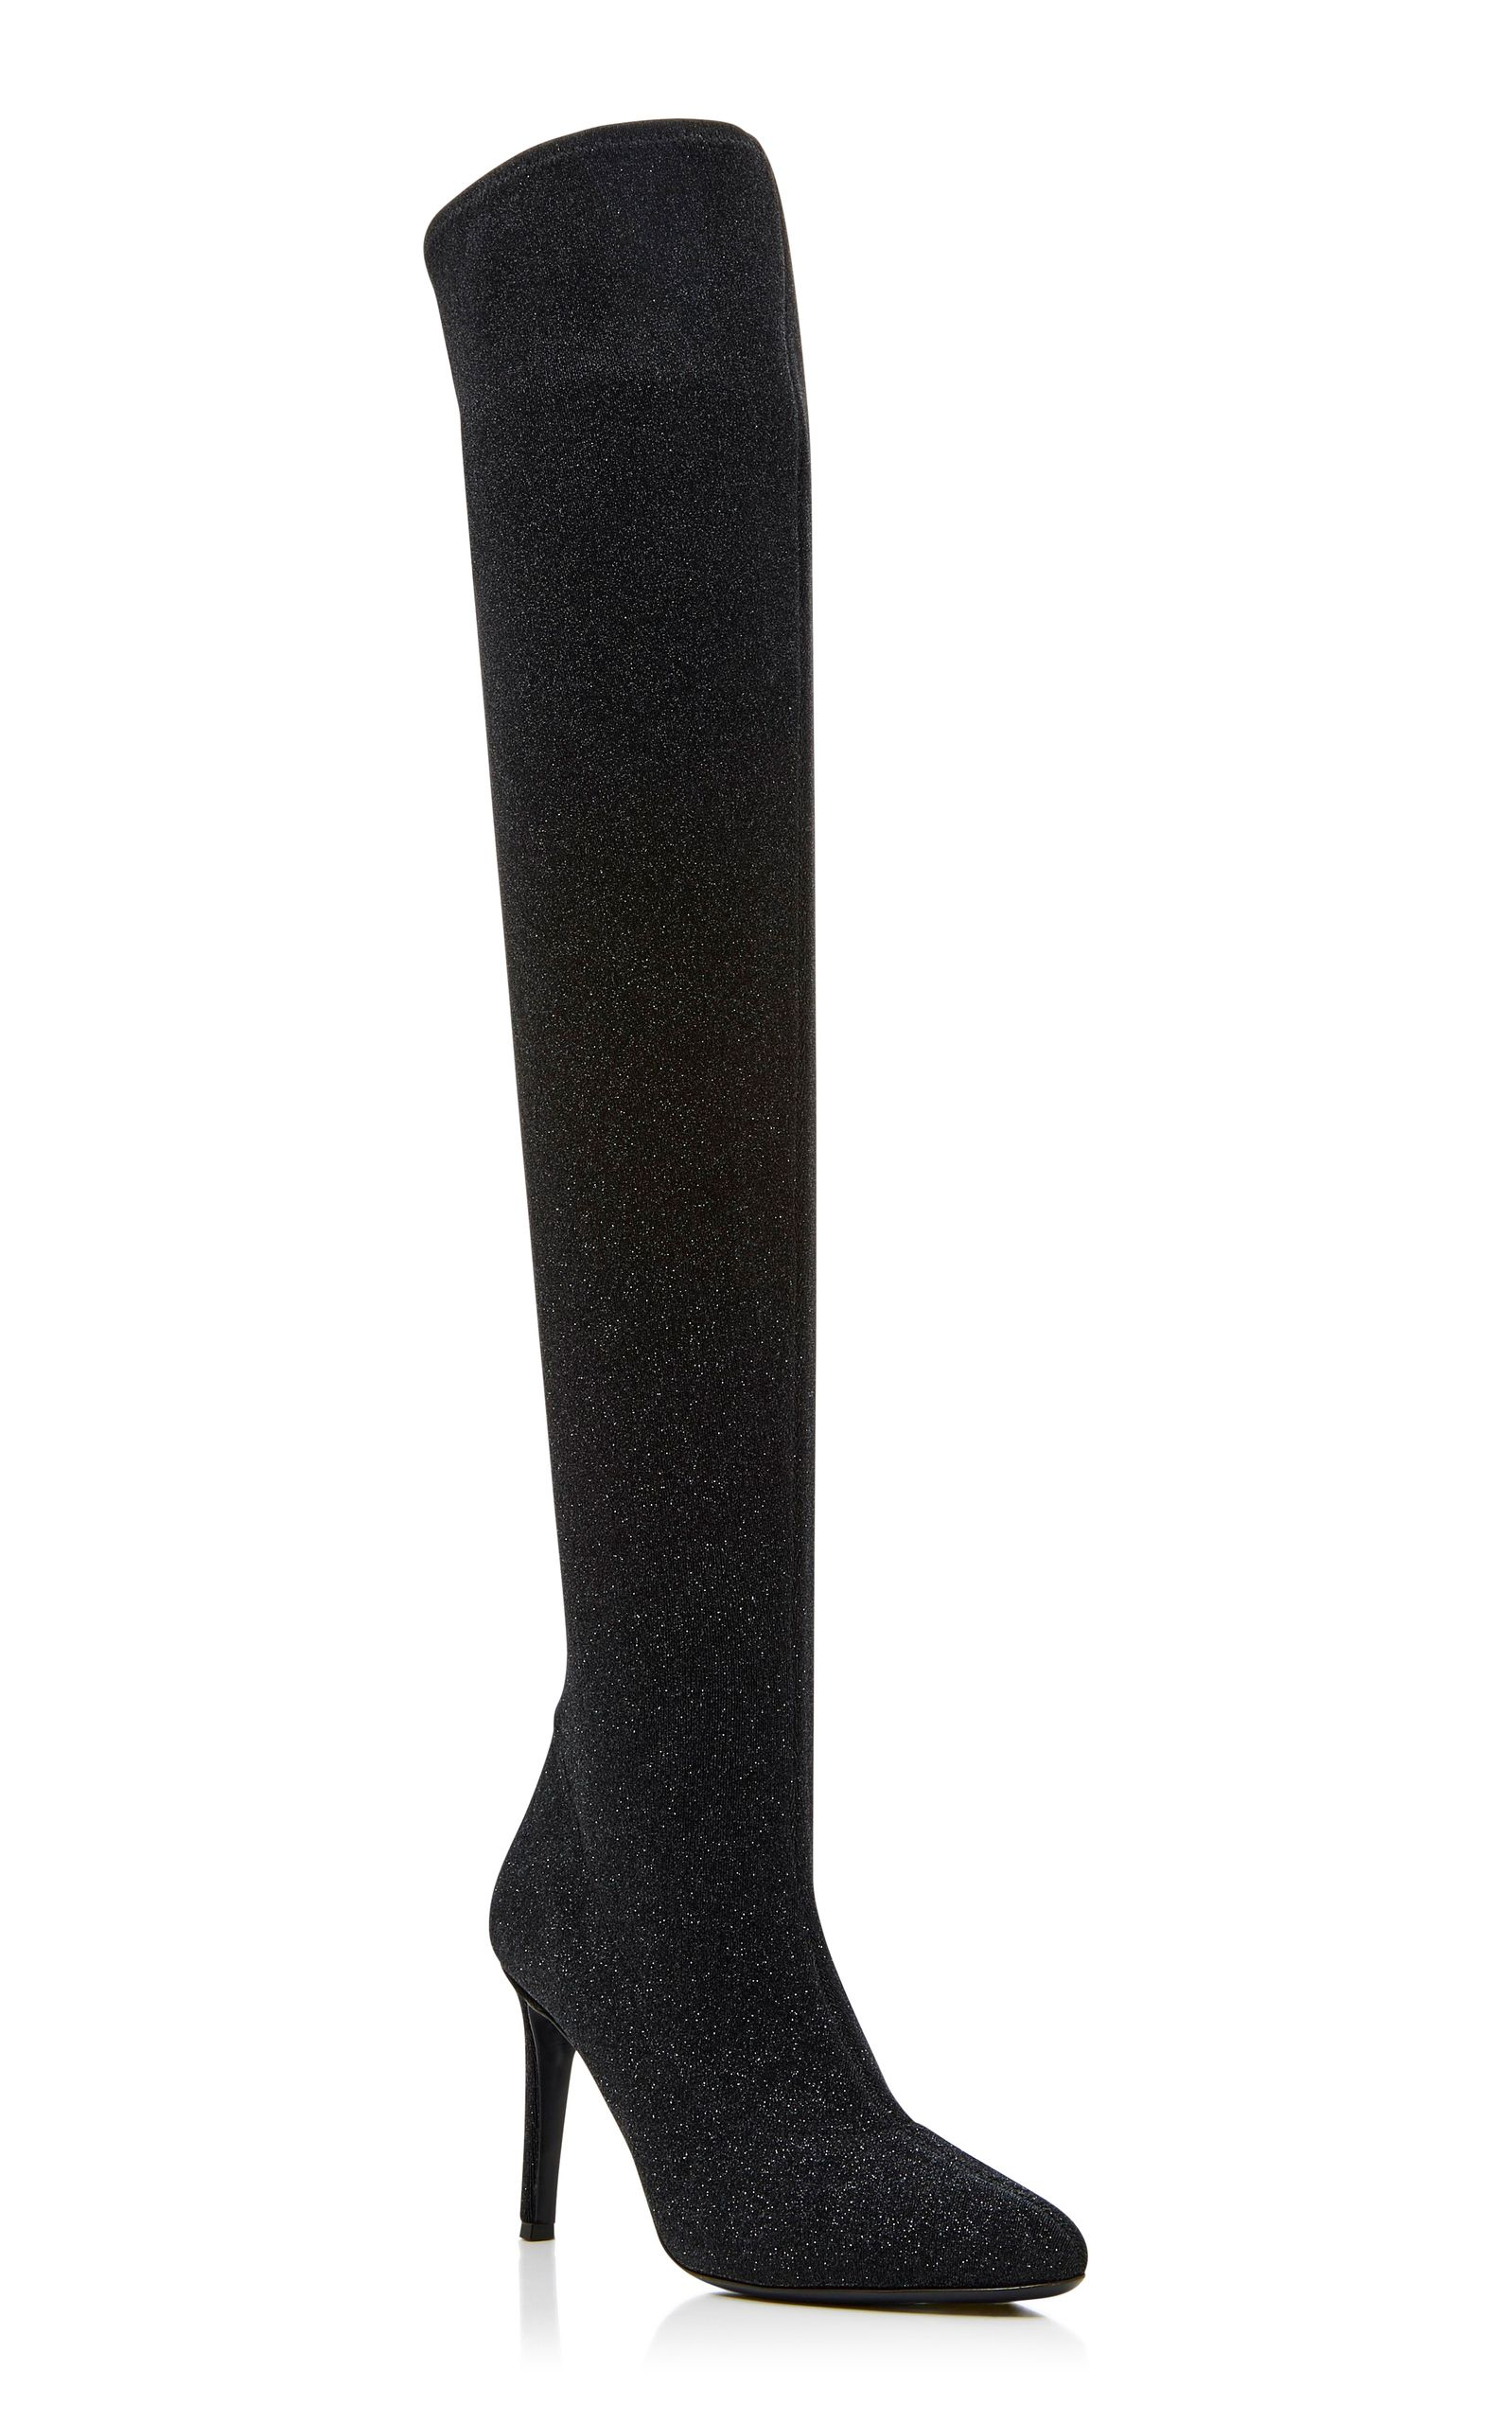 b01c6ade9df GIUSEPPE ZANOTTI Bimba Stretch-Knit Over-The-Knee Boots.  giuseppezanotti   shoes  boots